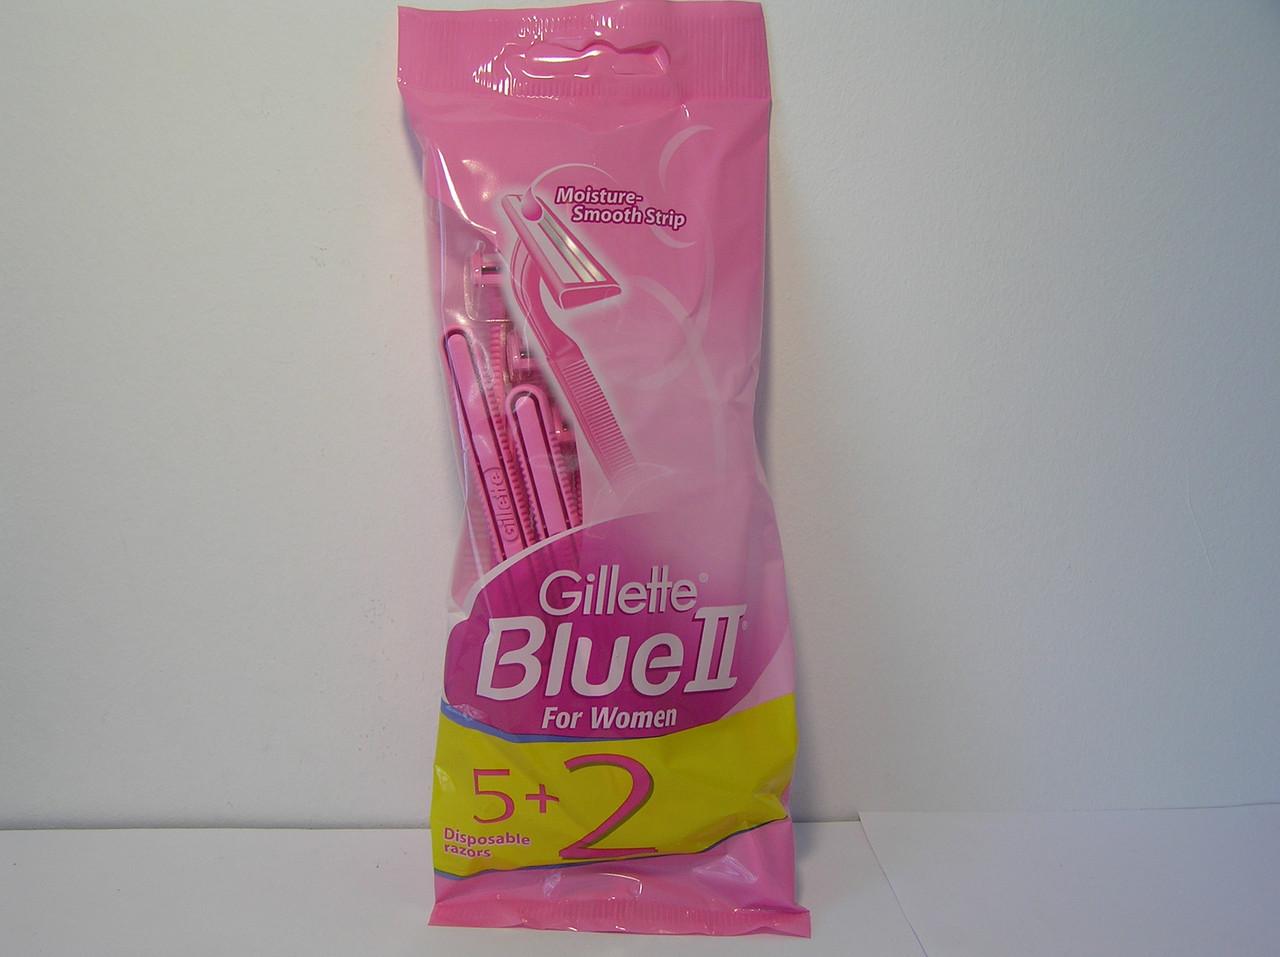 Gillette Жиллетт Blue II Блю 2 станок женский одноразовый 5+2 шт.